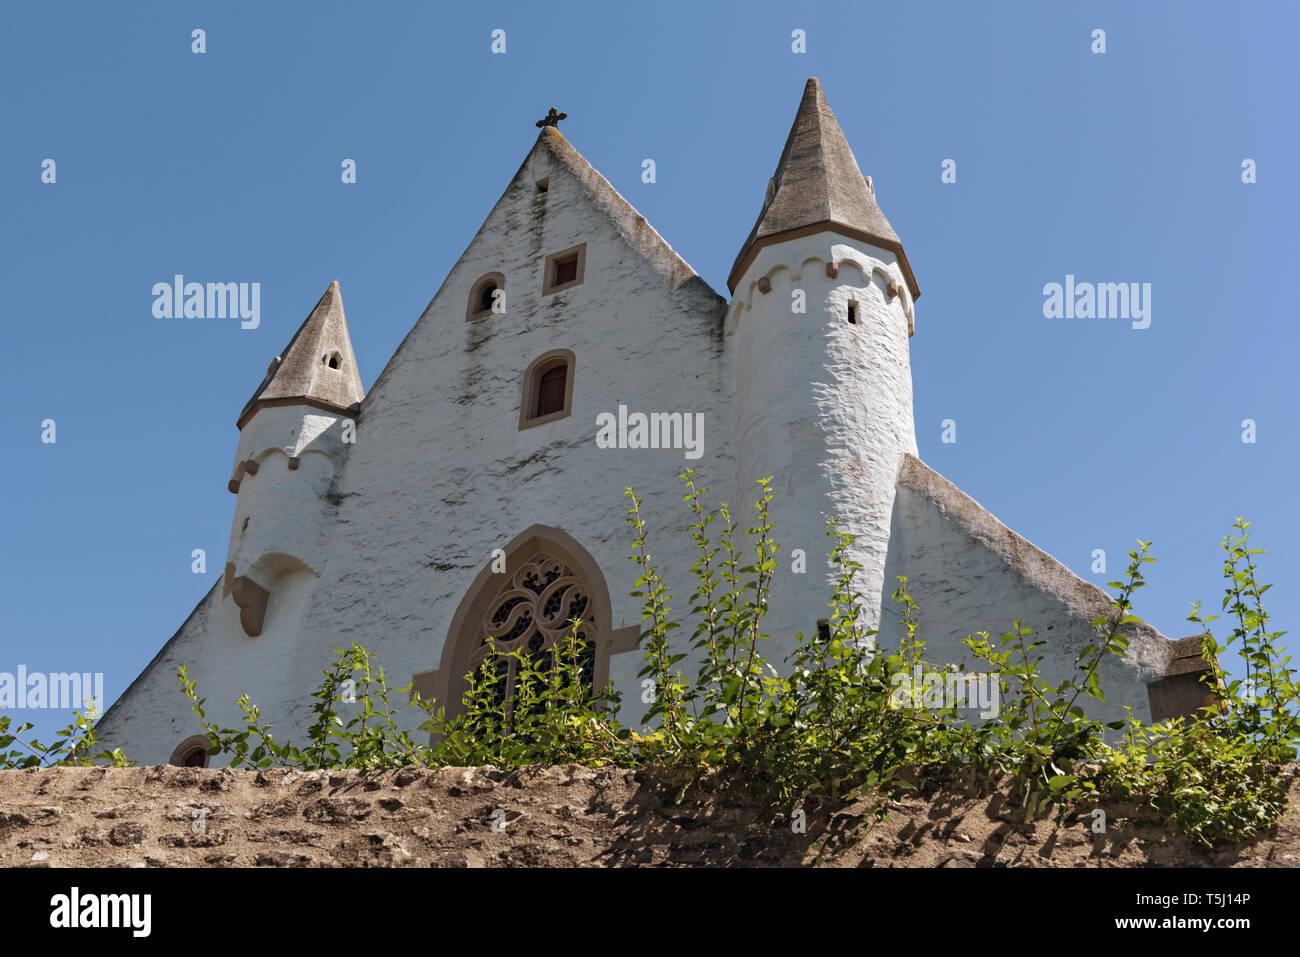 castle church with medieval city wall in ober ingelheim city rheinhessen rhineland palatinate germany Stock Photo